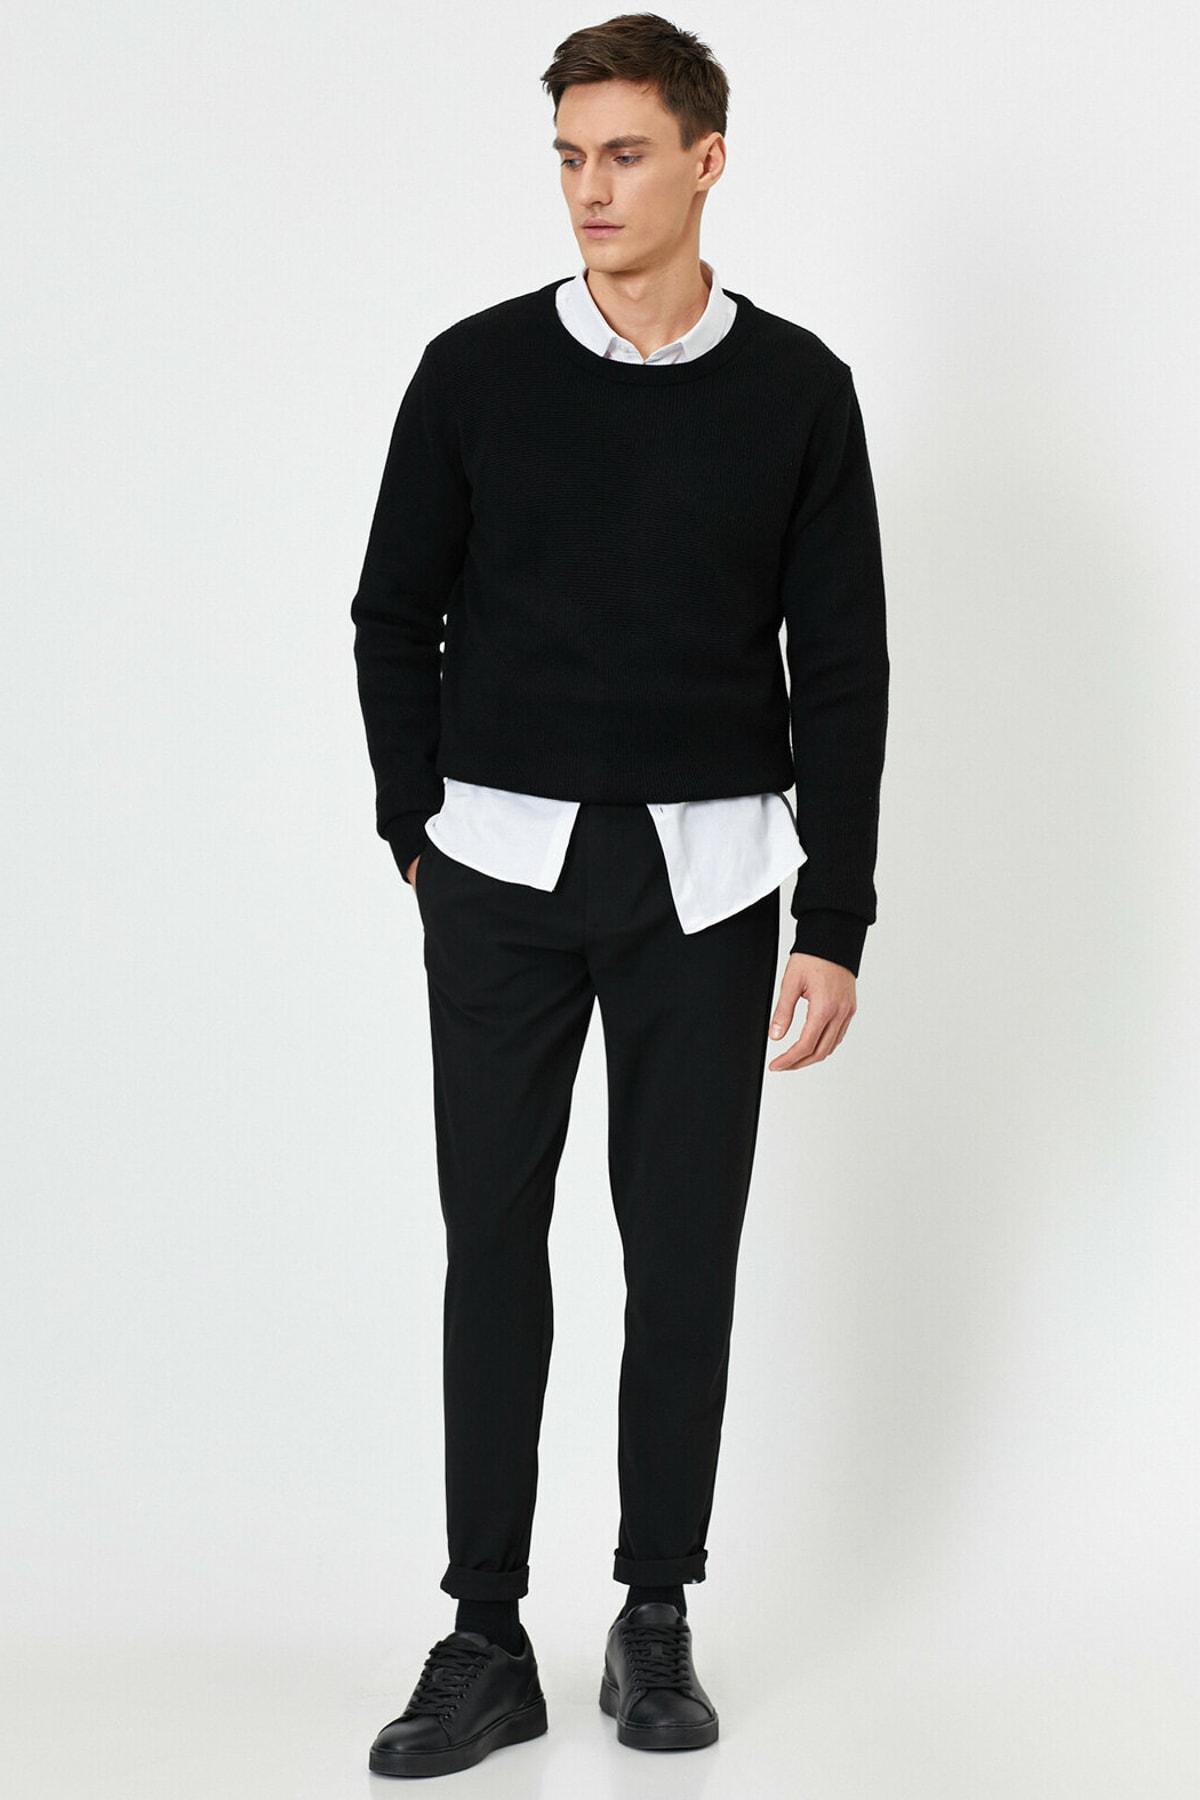 Erkek Beli Baglamali Lastikli Rahat Fit Pantolon